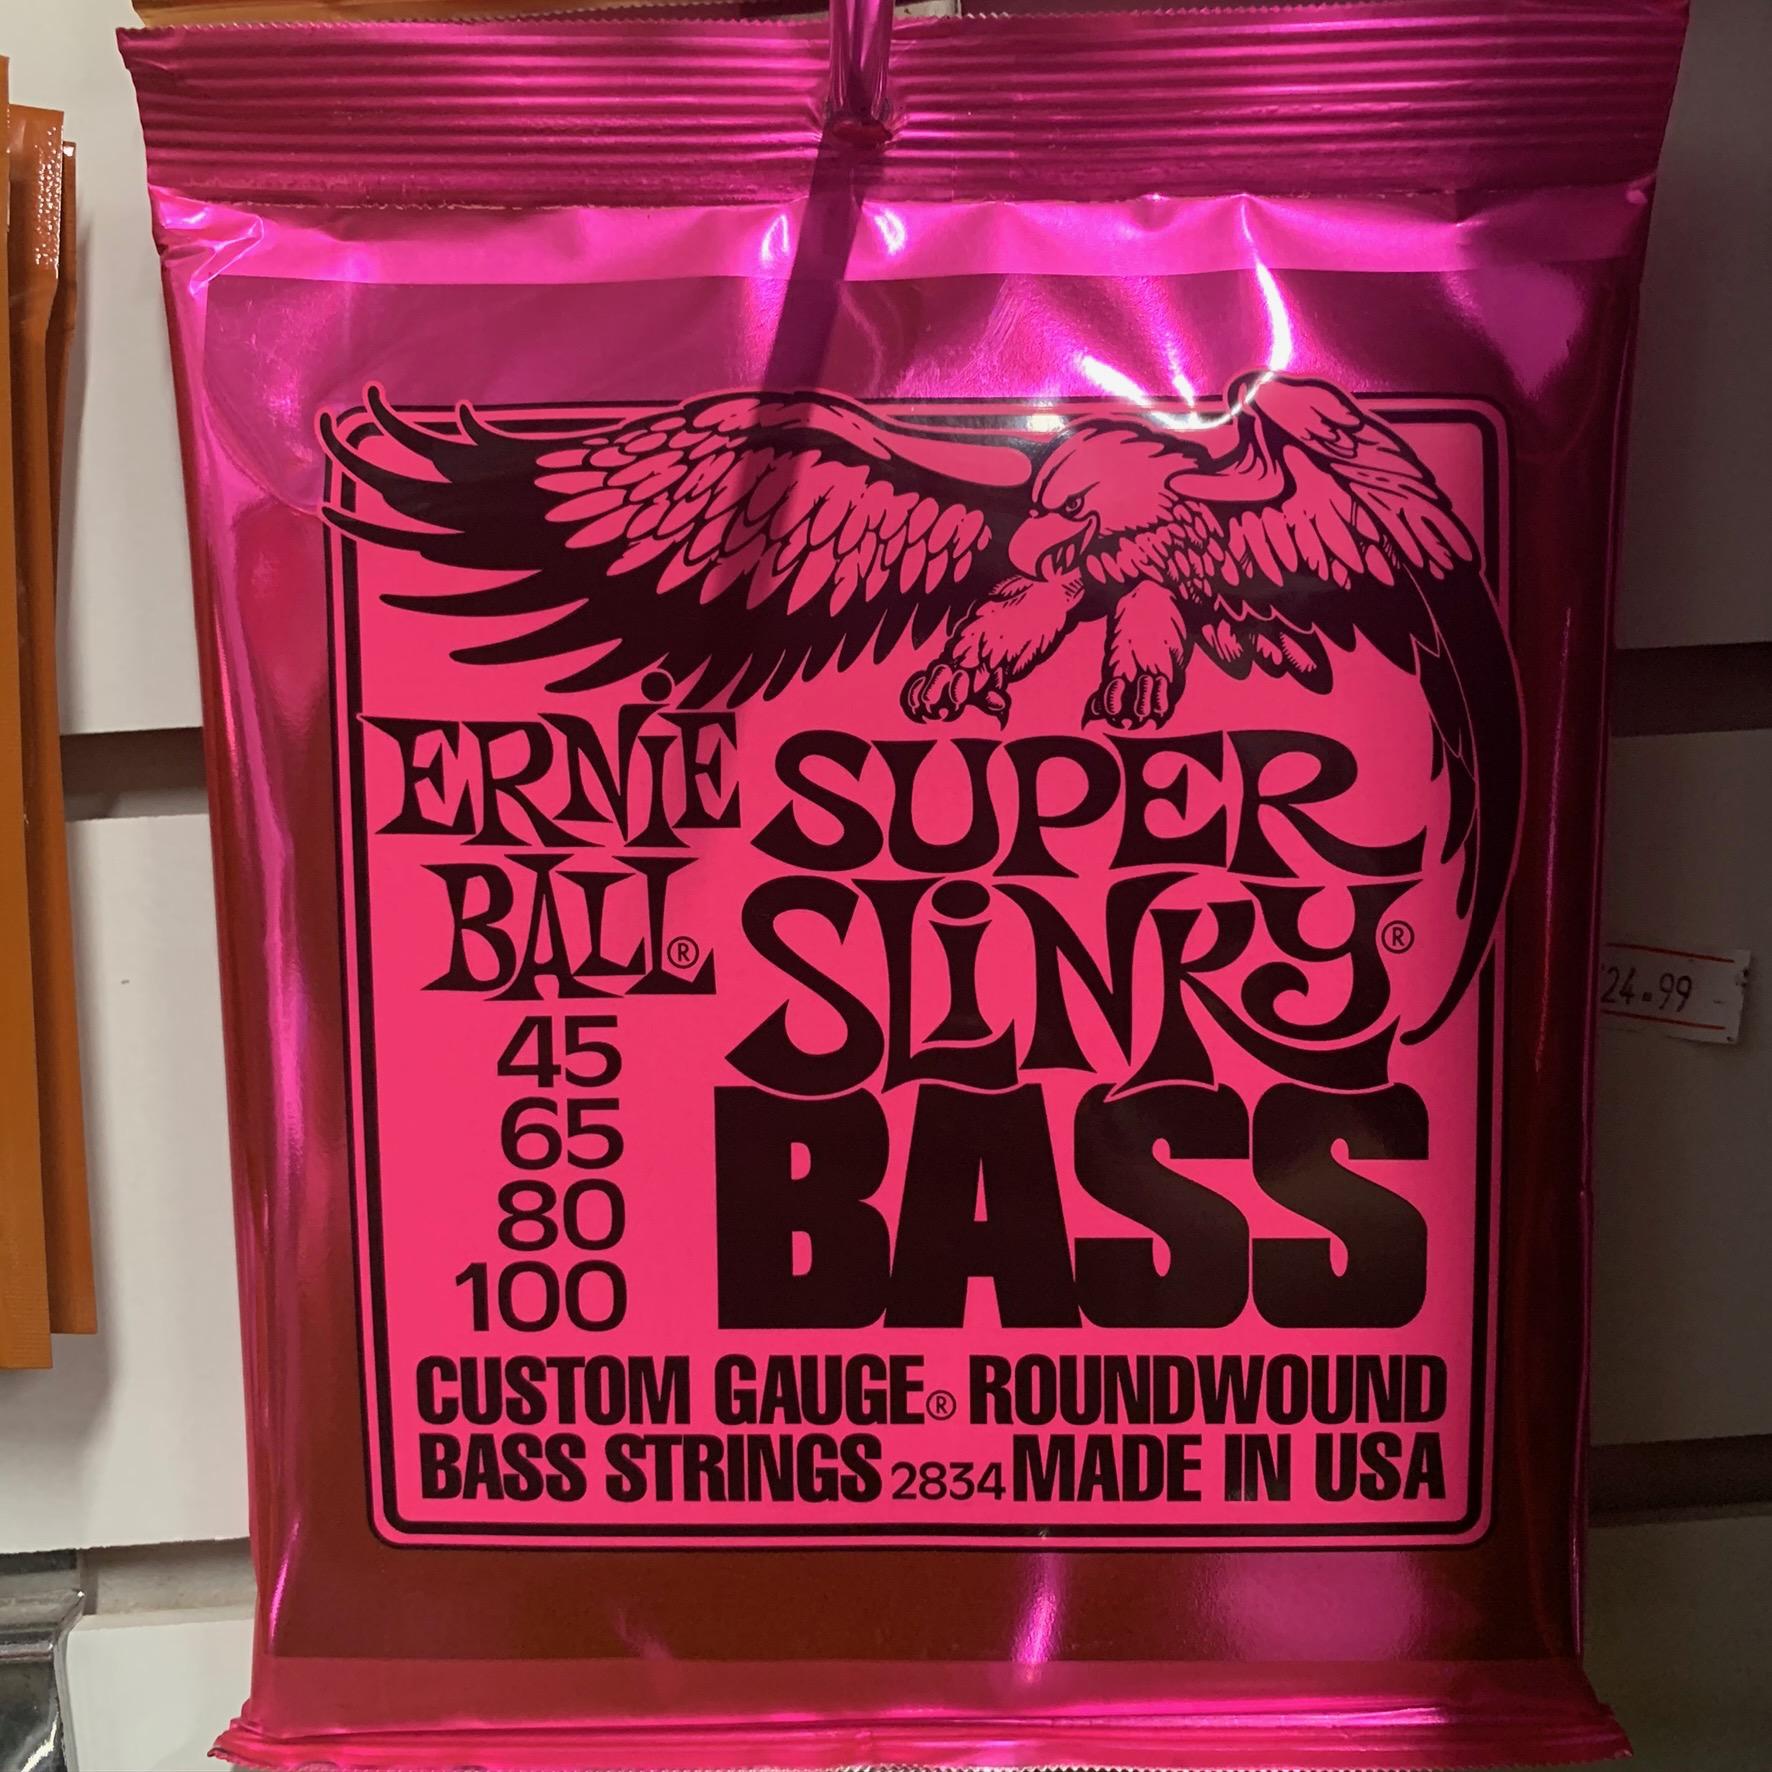 EB SUPER SLINKY BASS 45 - 100